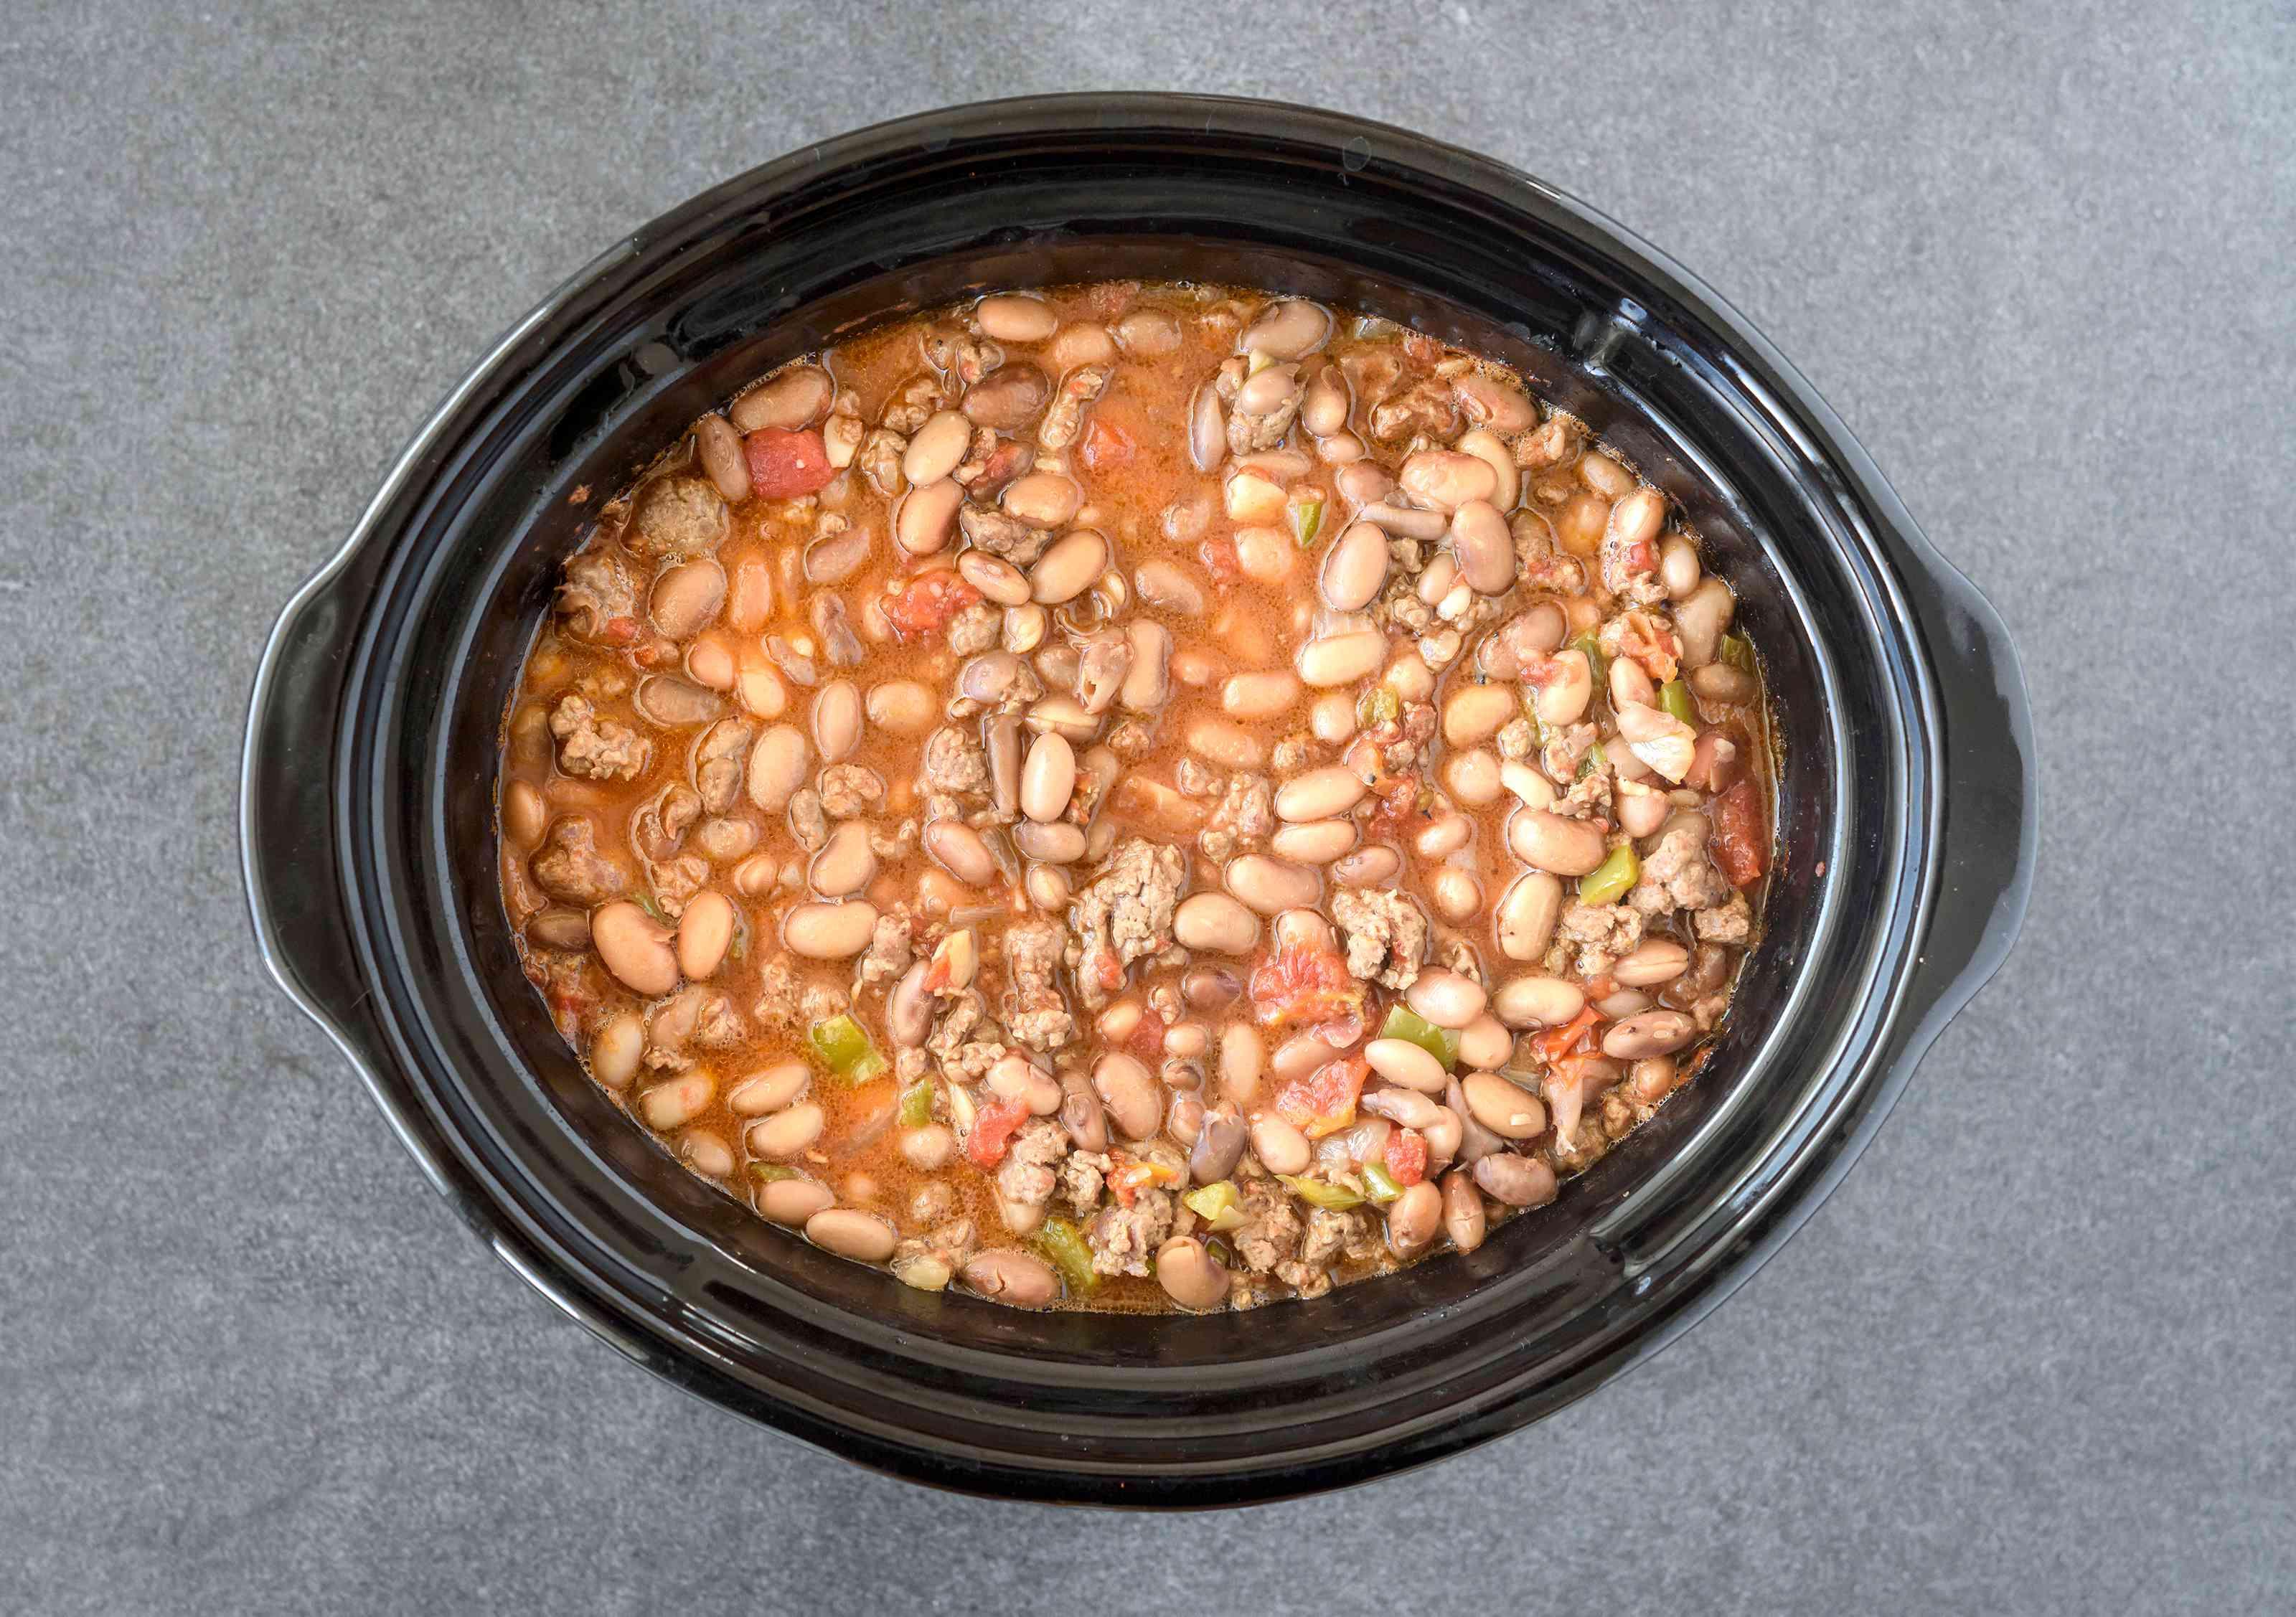 cook chili